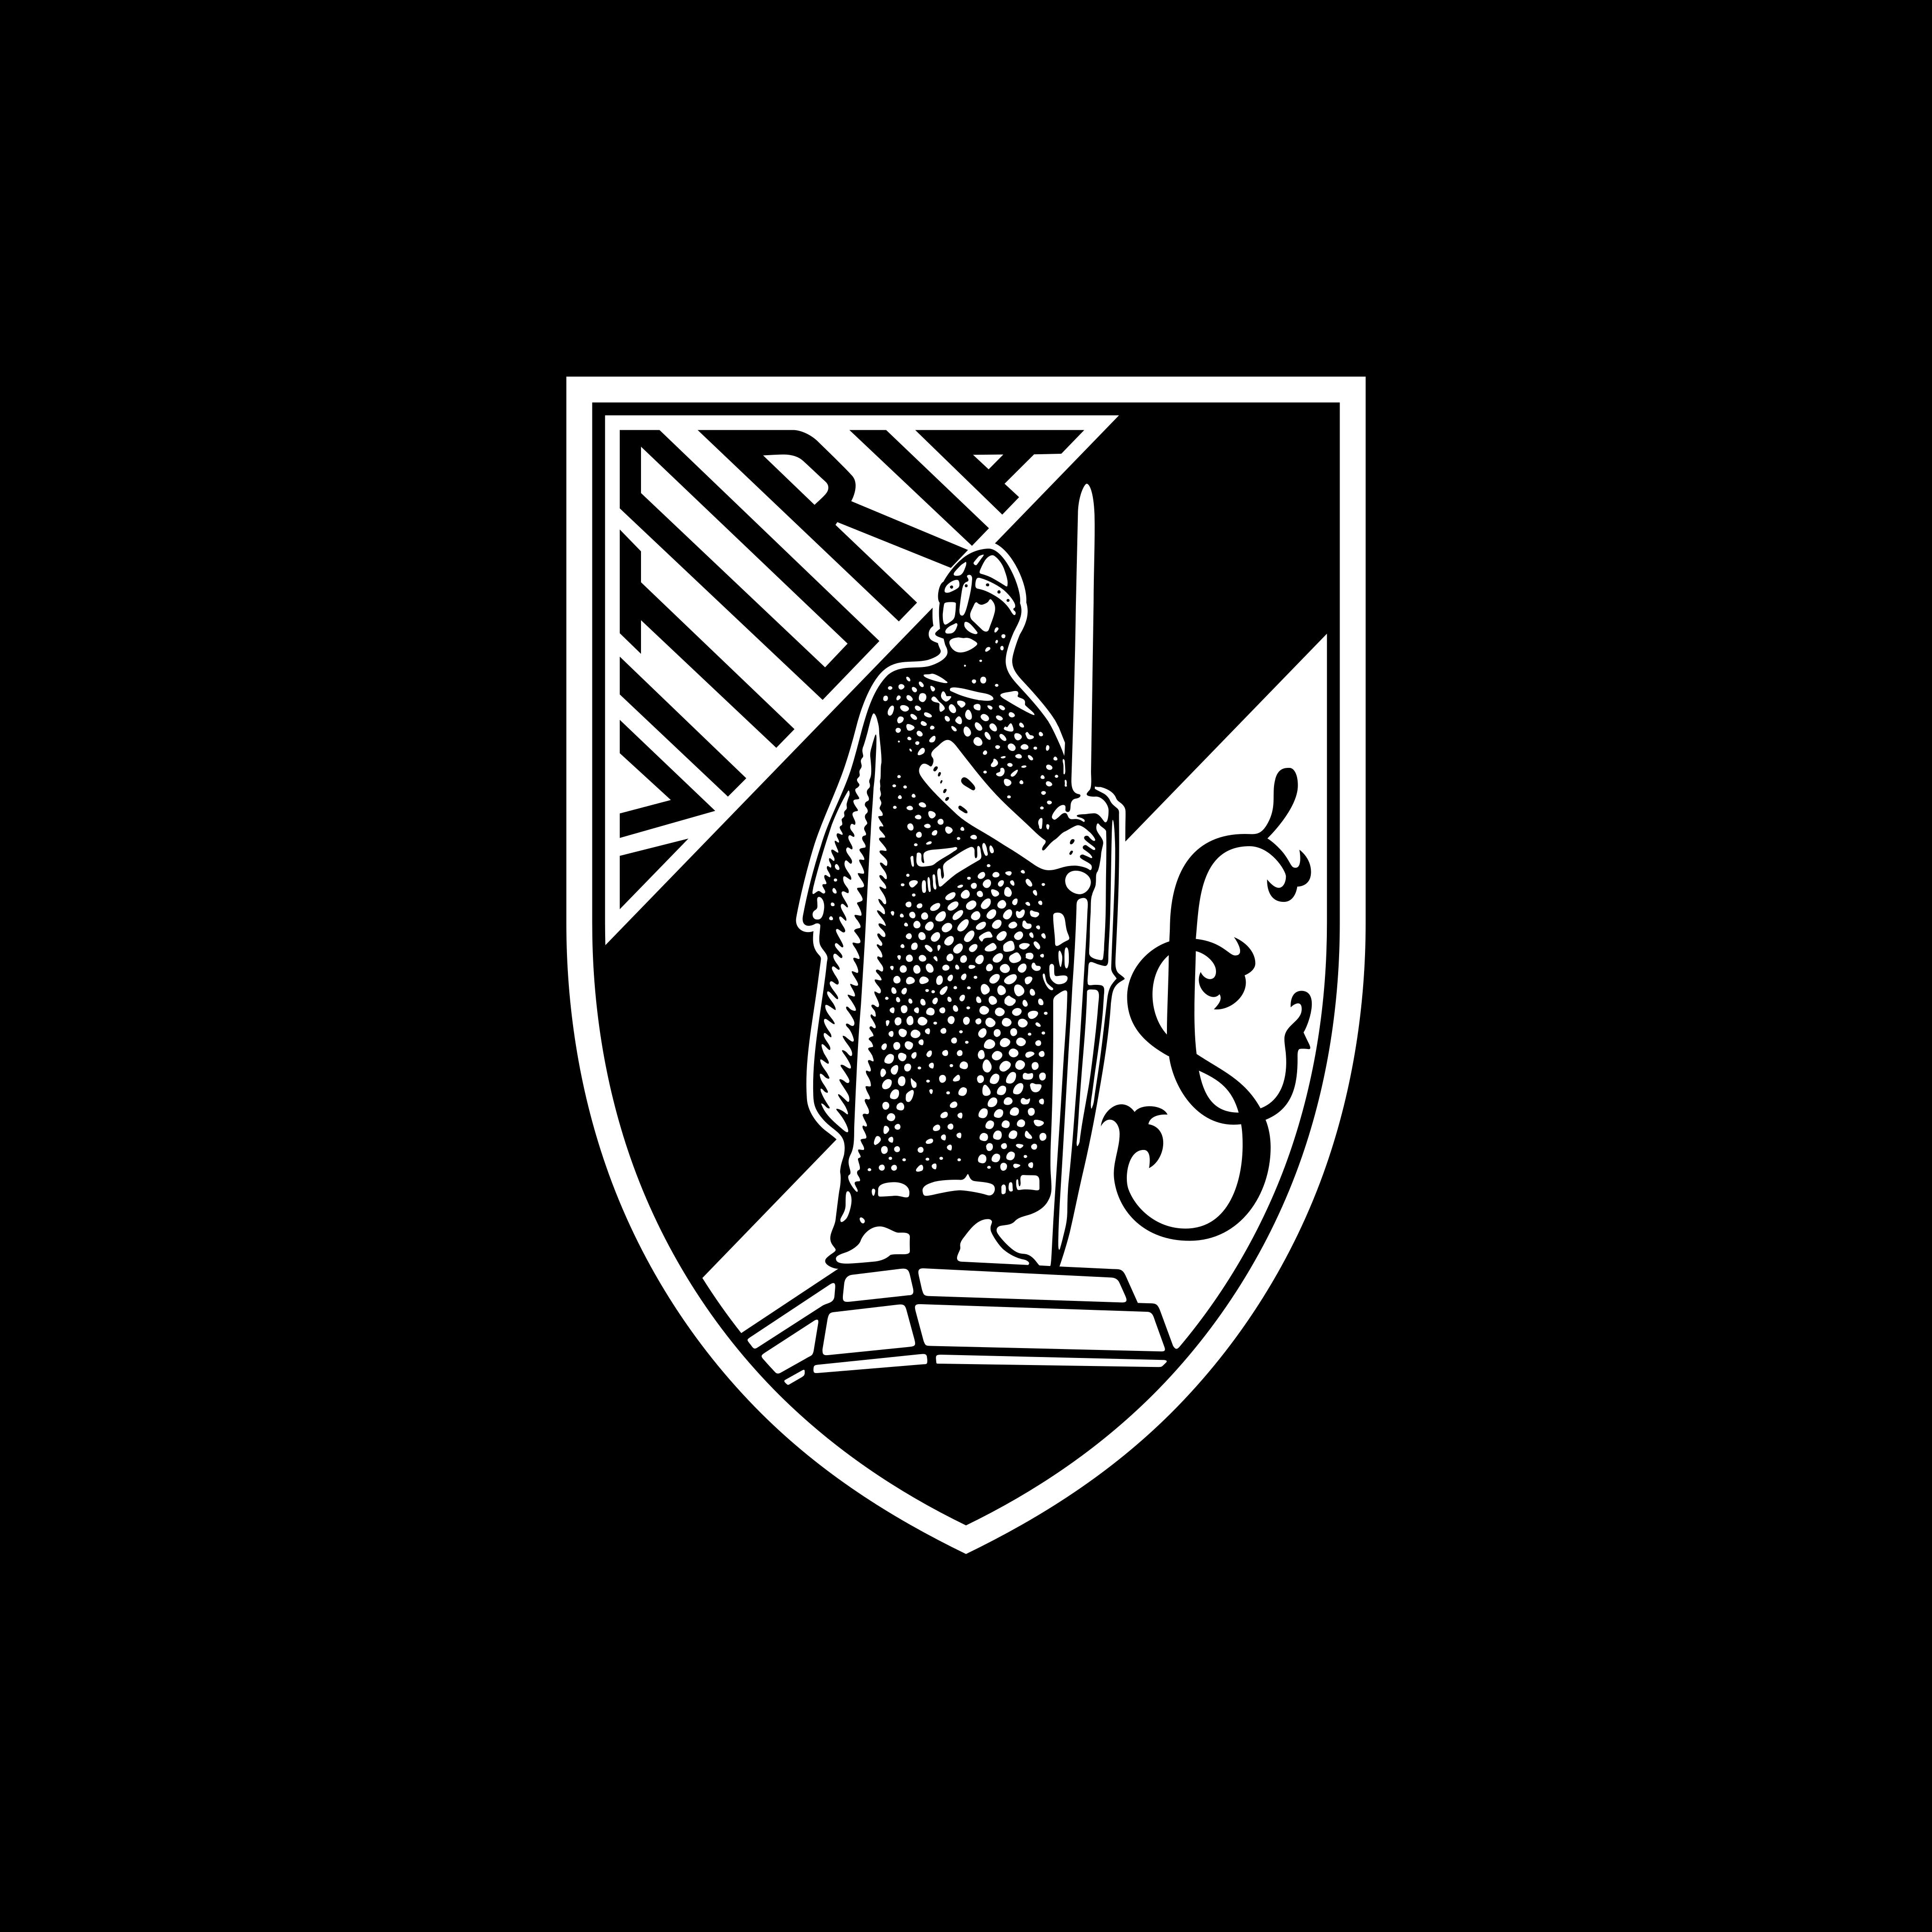 vitoria sport club logo 0 - Vitória Sport Clube Logo